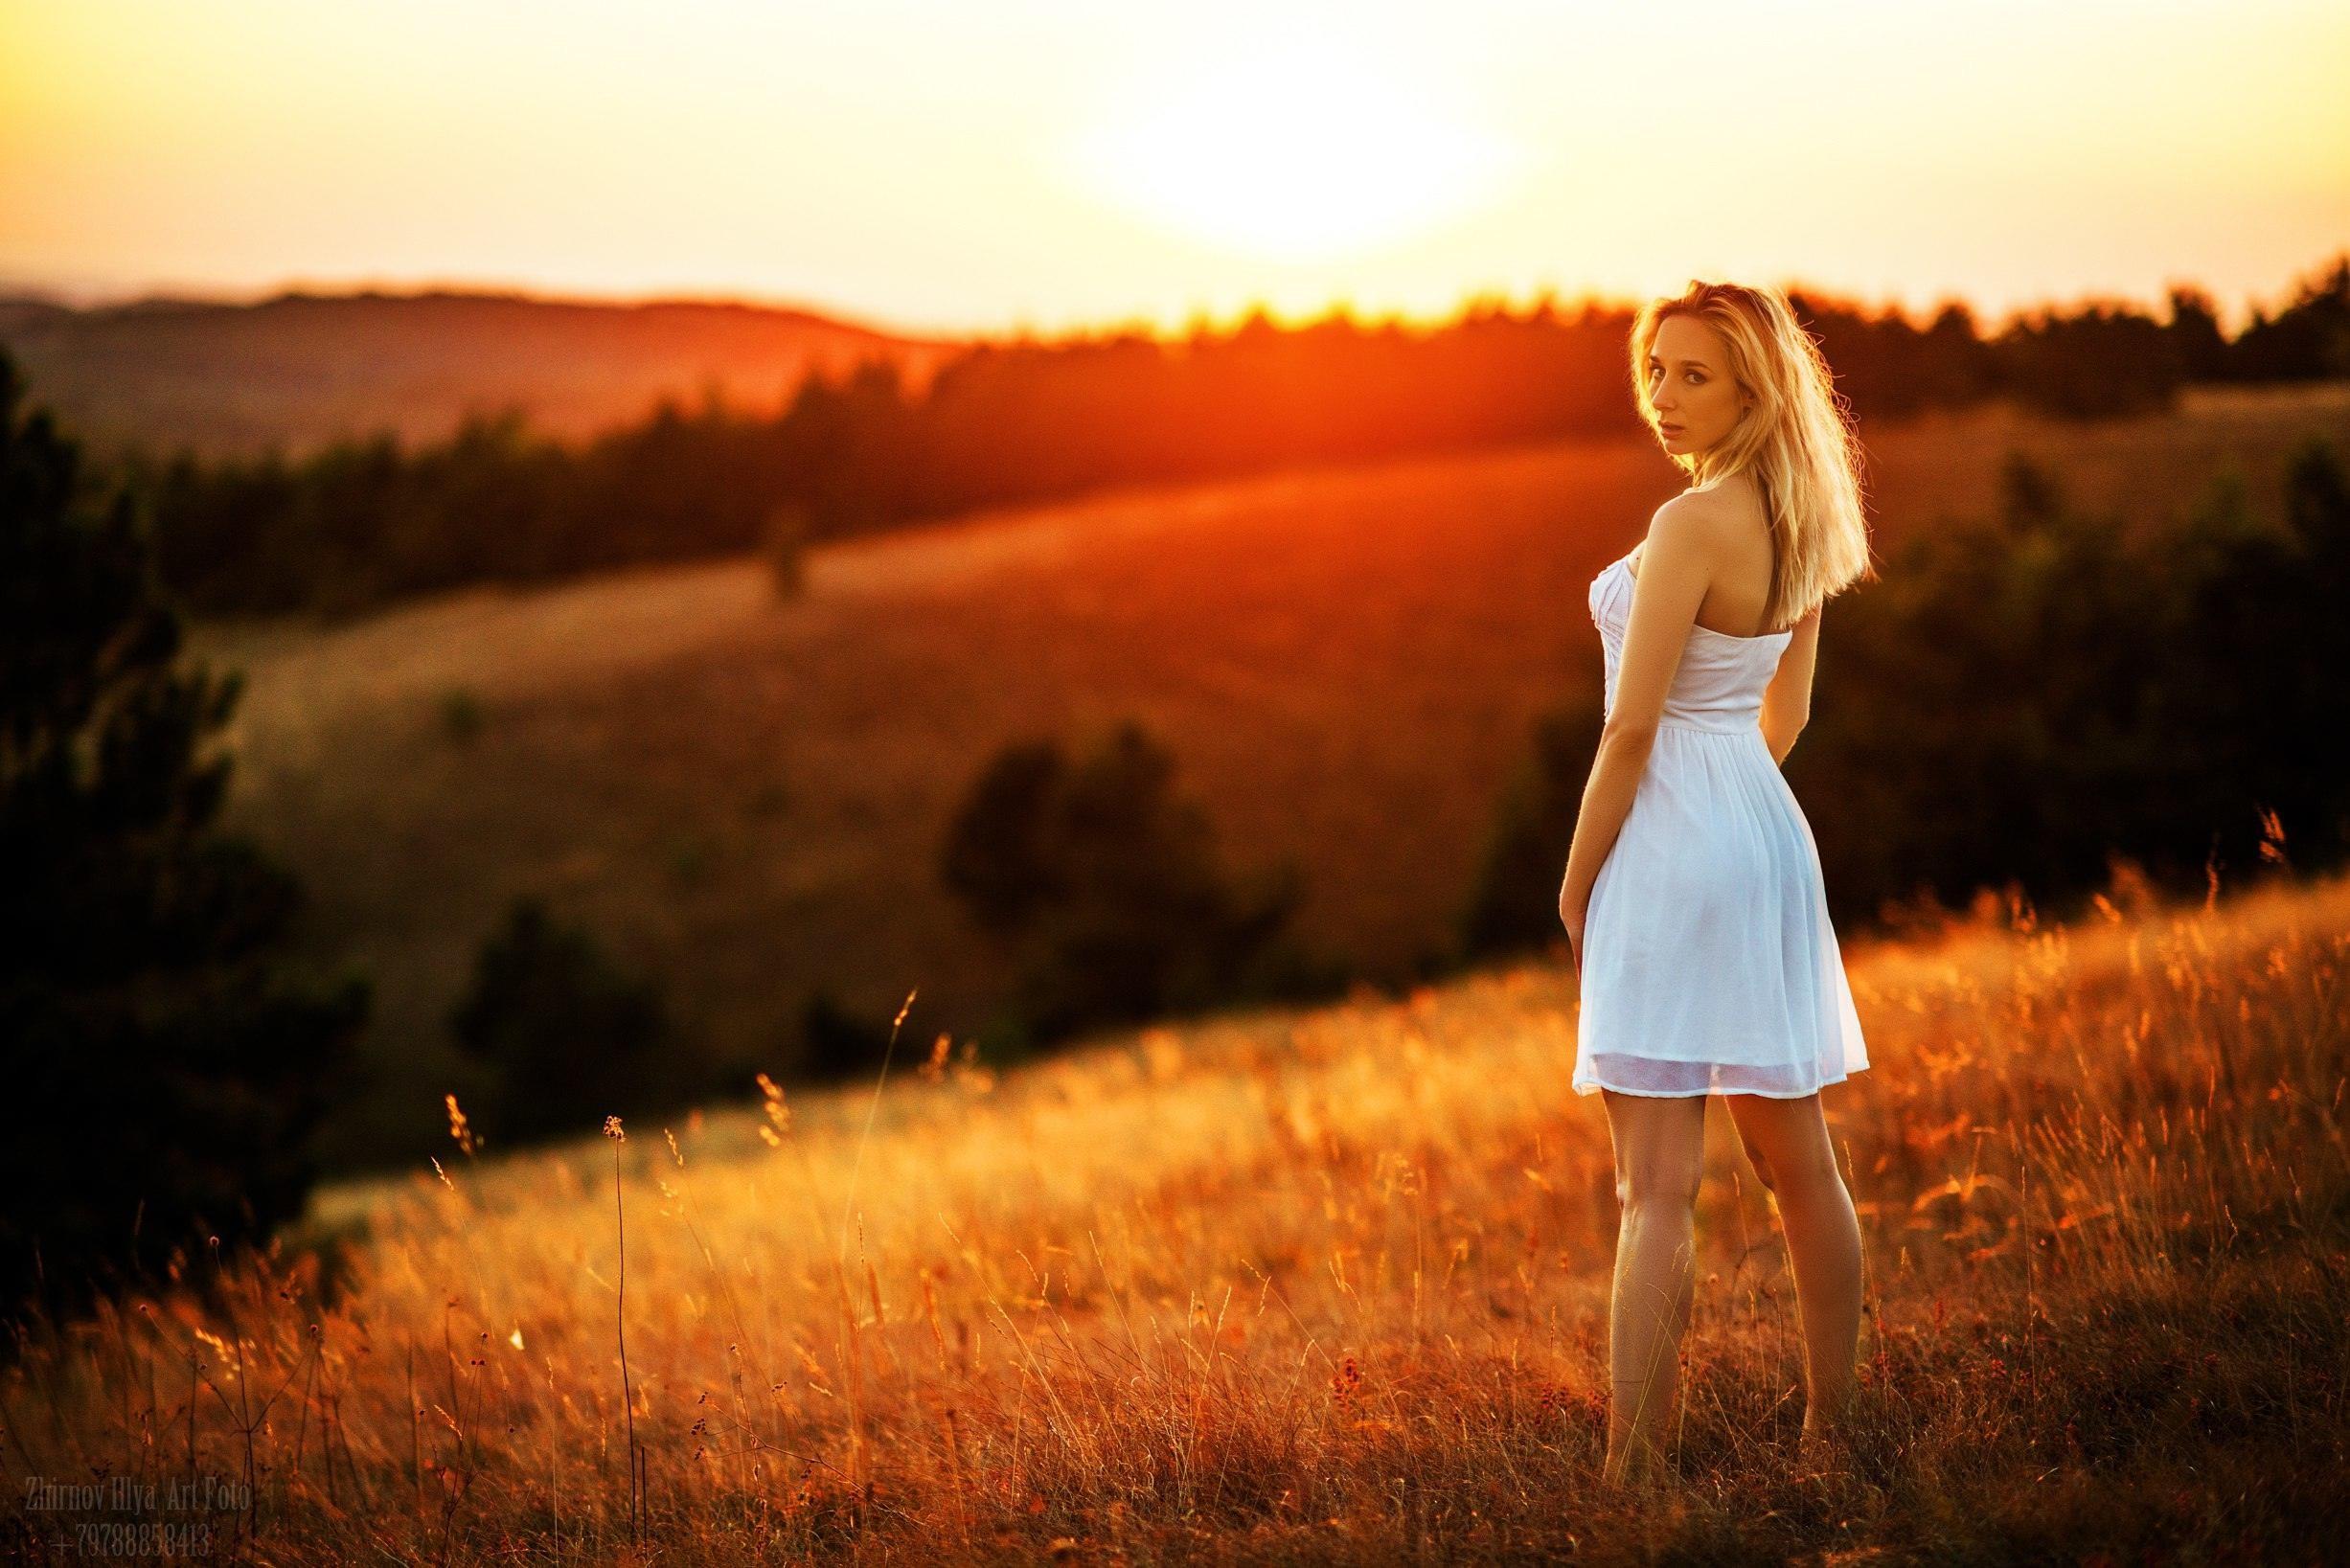 People 2453x1637 women model blonde strapless dress white dress summer  dress field looking  over shoulder legs looking at viewer women outdoors Ilya Zhirnov